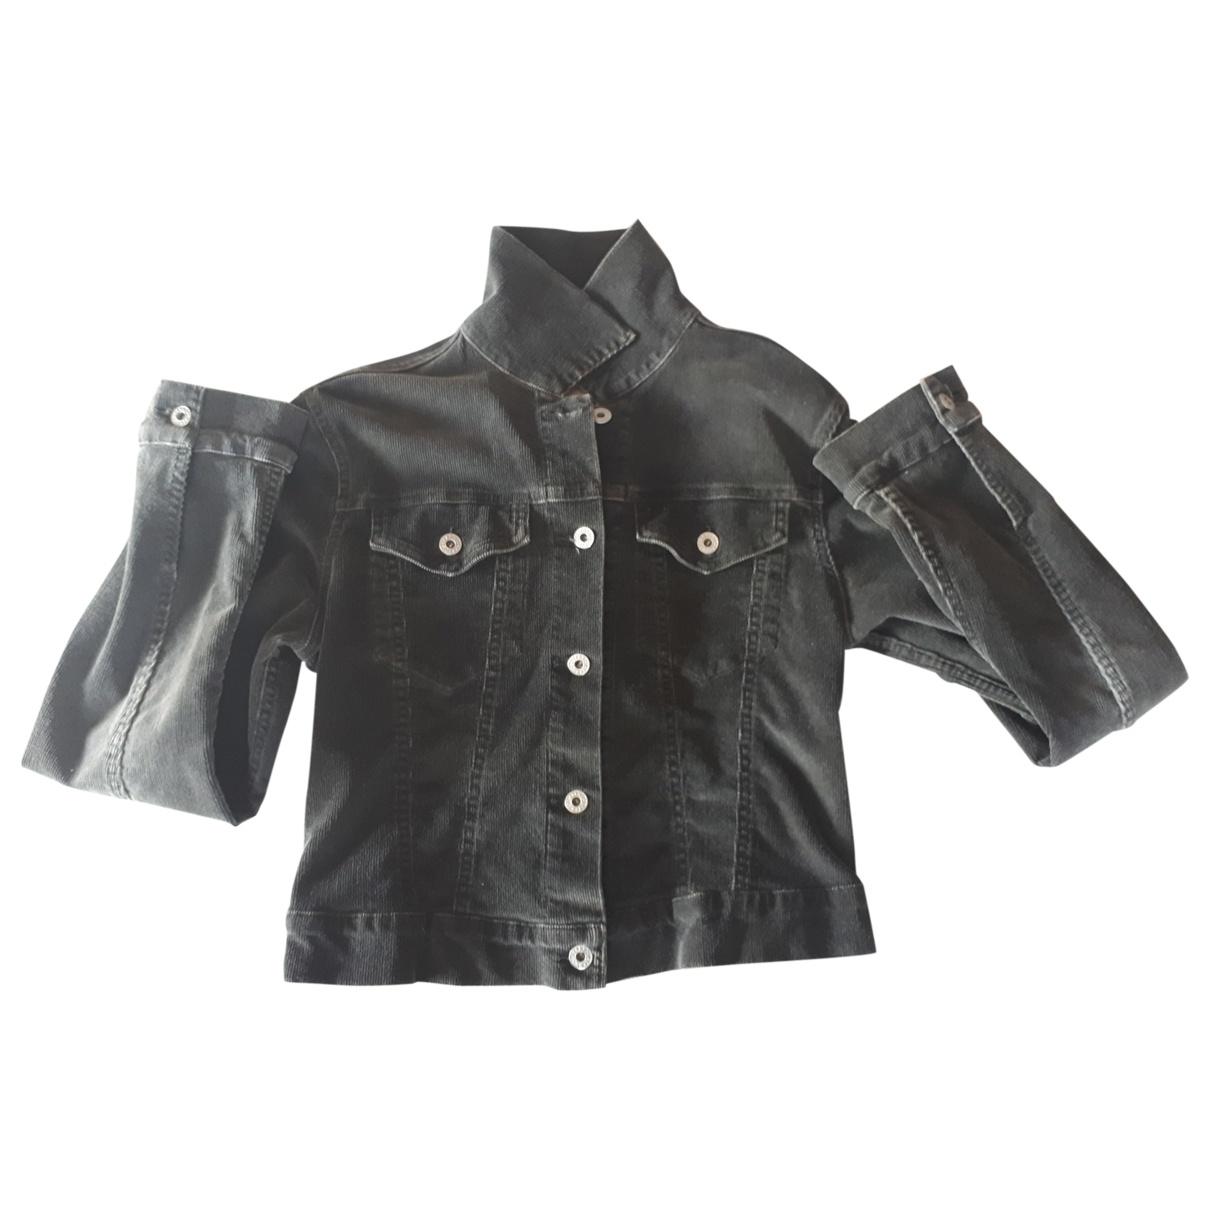 Replay \N Grey Denim - Jeans jacket for Women 42 IT